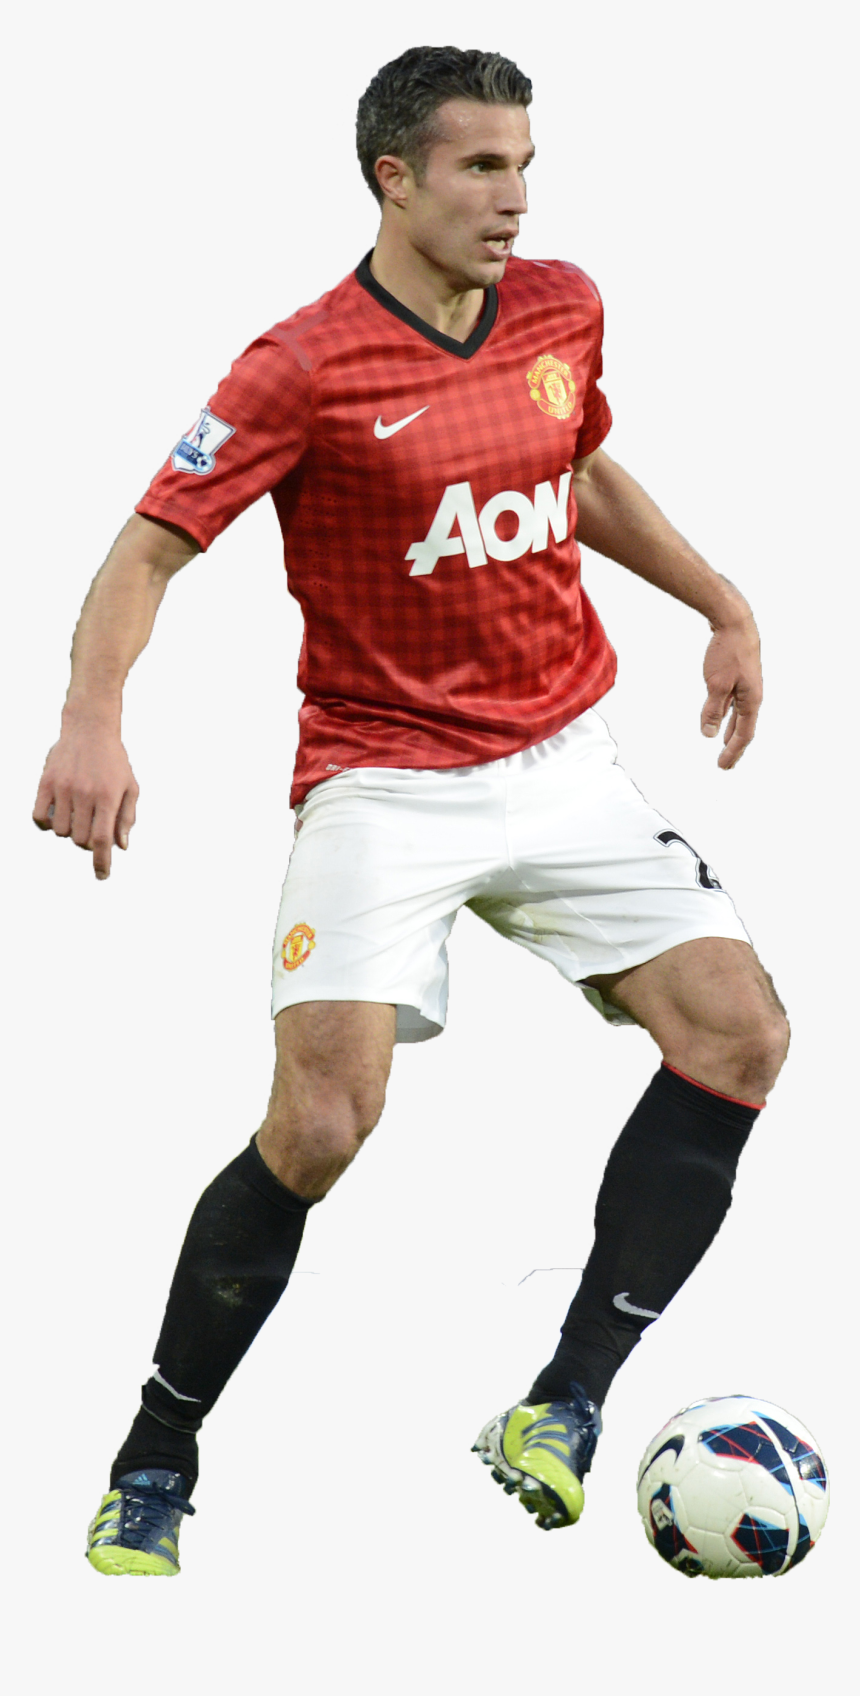 Robin Van Persie Png Man Utd - Cr7 Manchester United Png, Transparent Png, Free Download